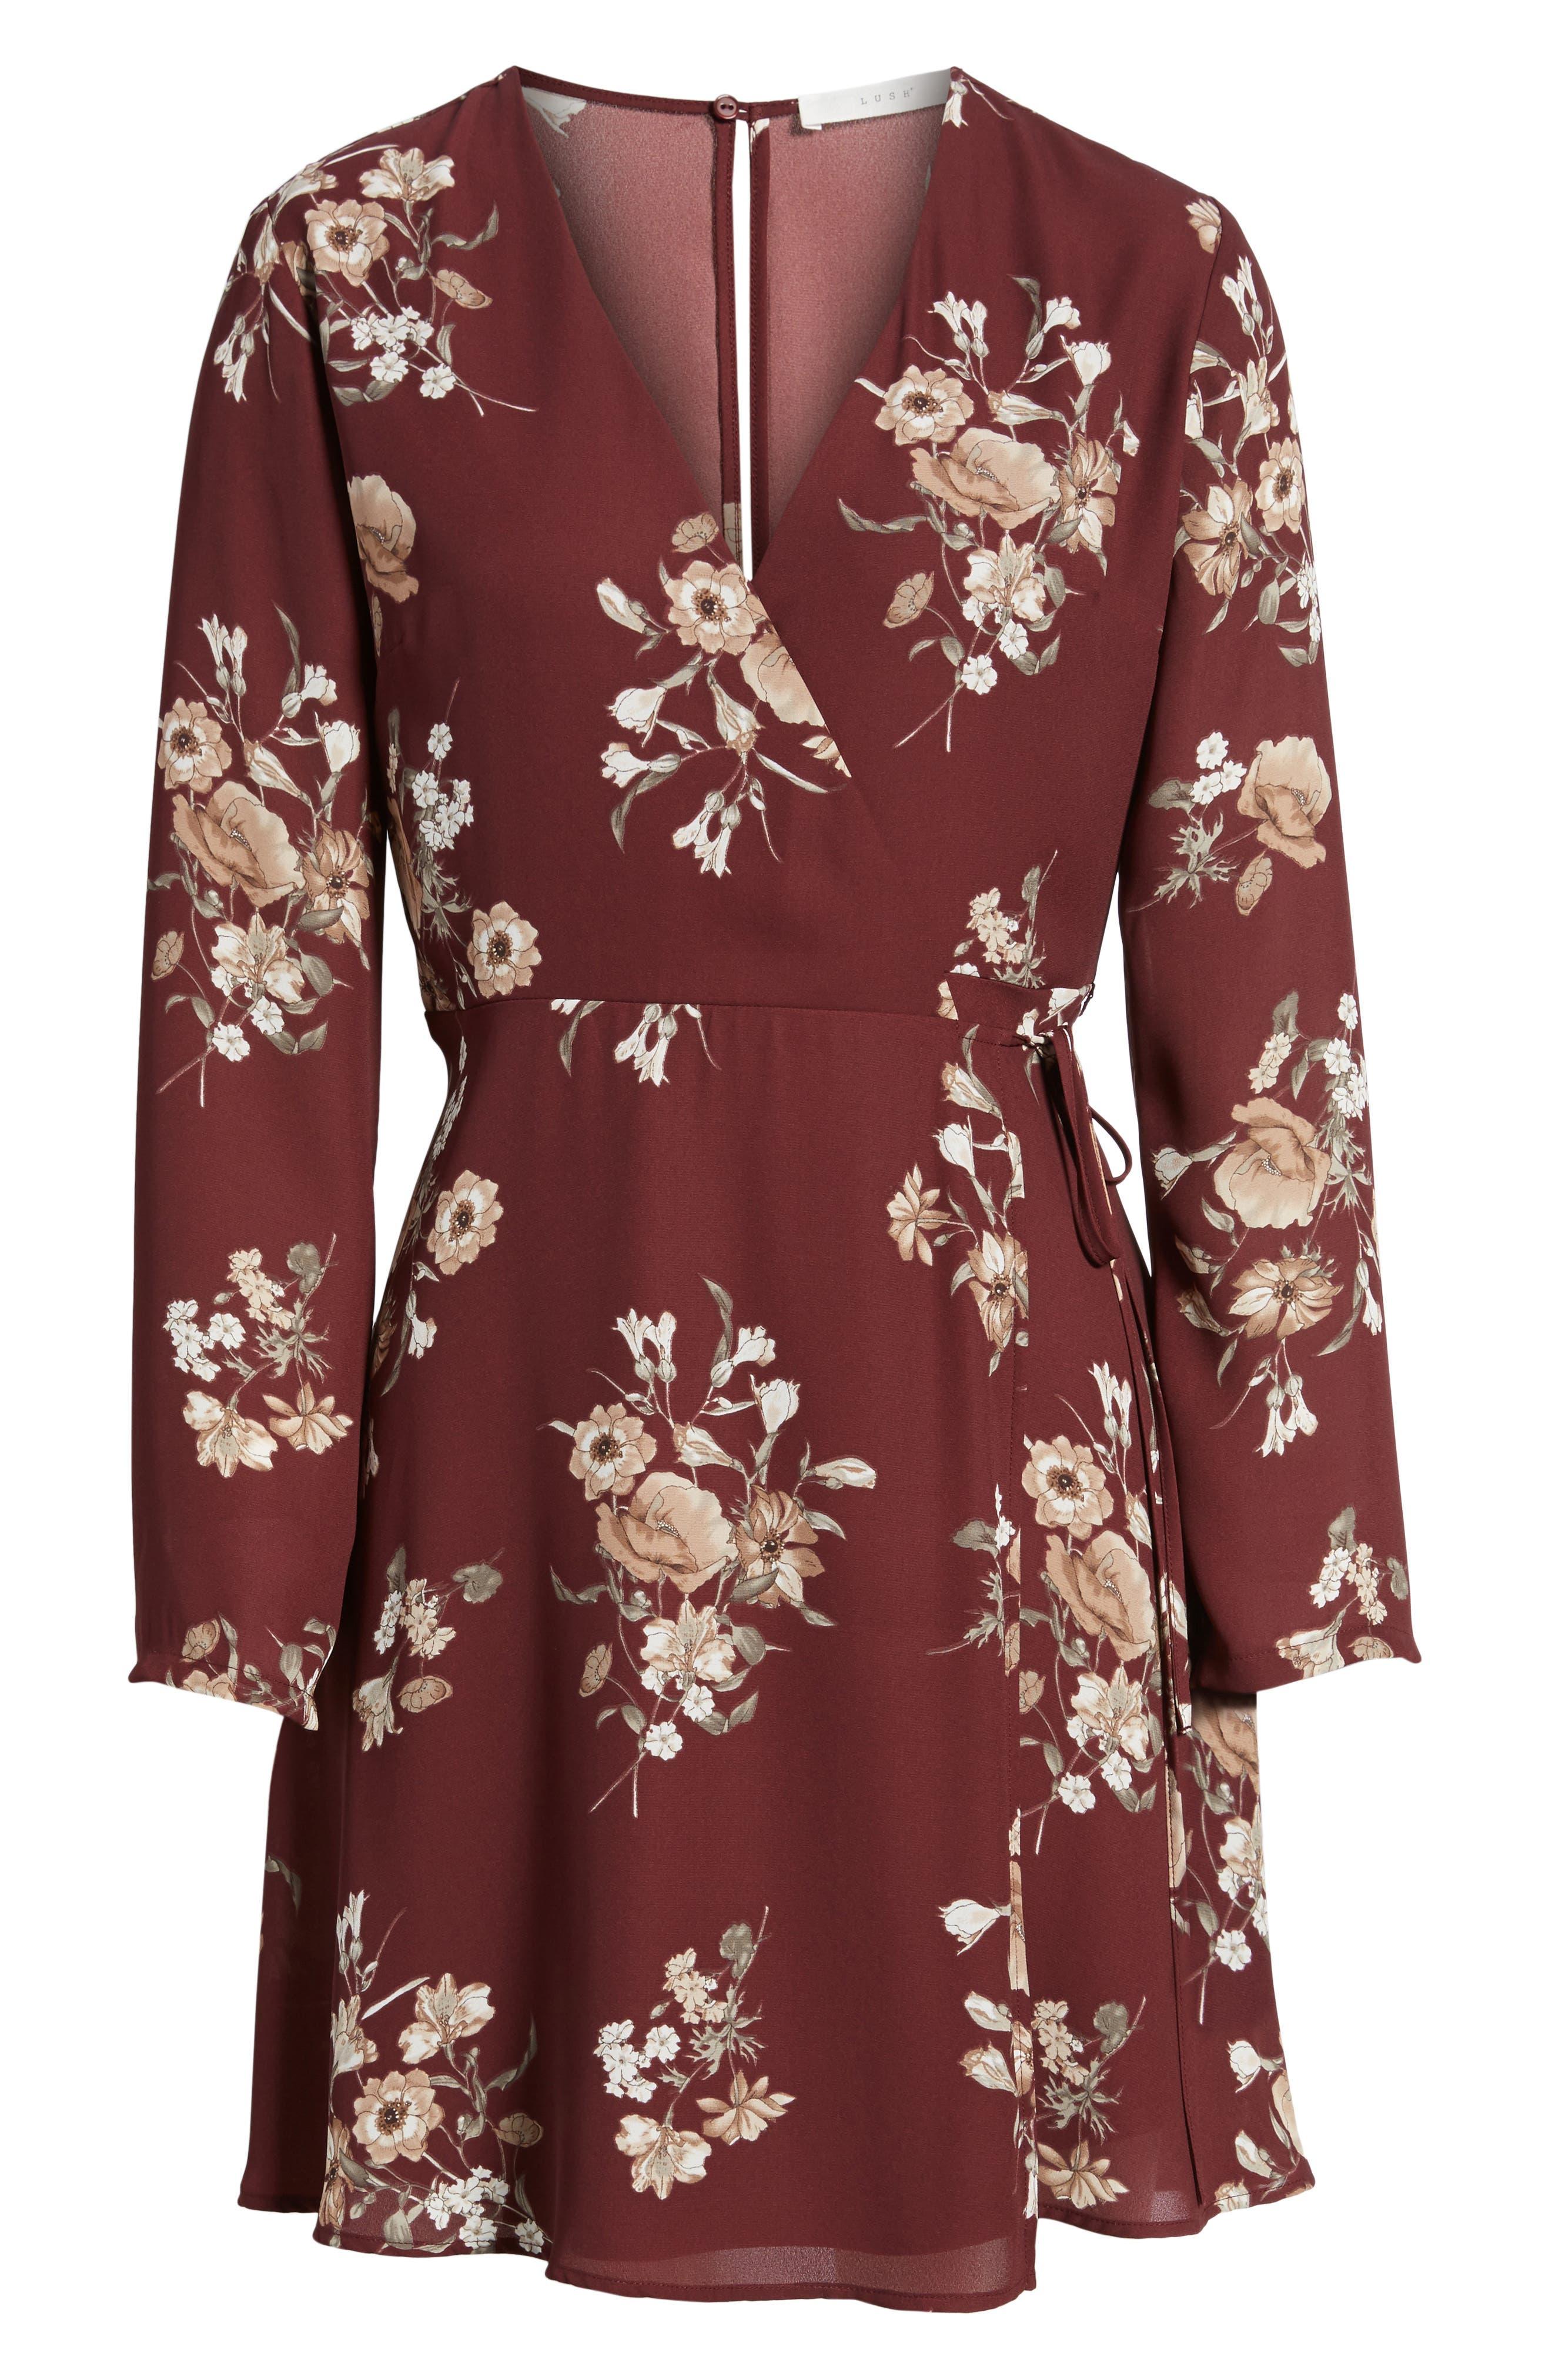 Elly Wrap Dress,                             Alternate thumbnail 6, color,                             Burgundy Floral